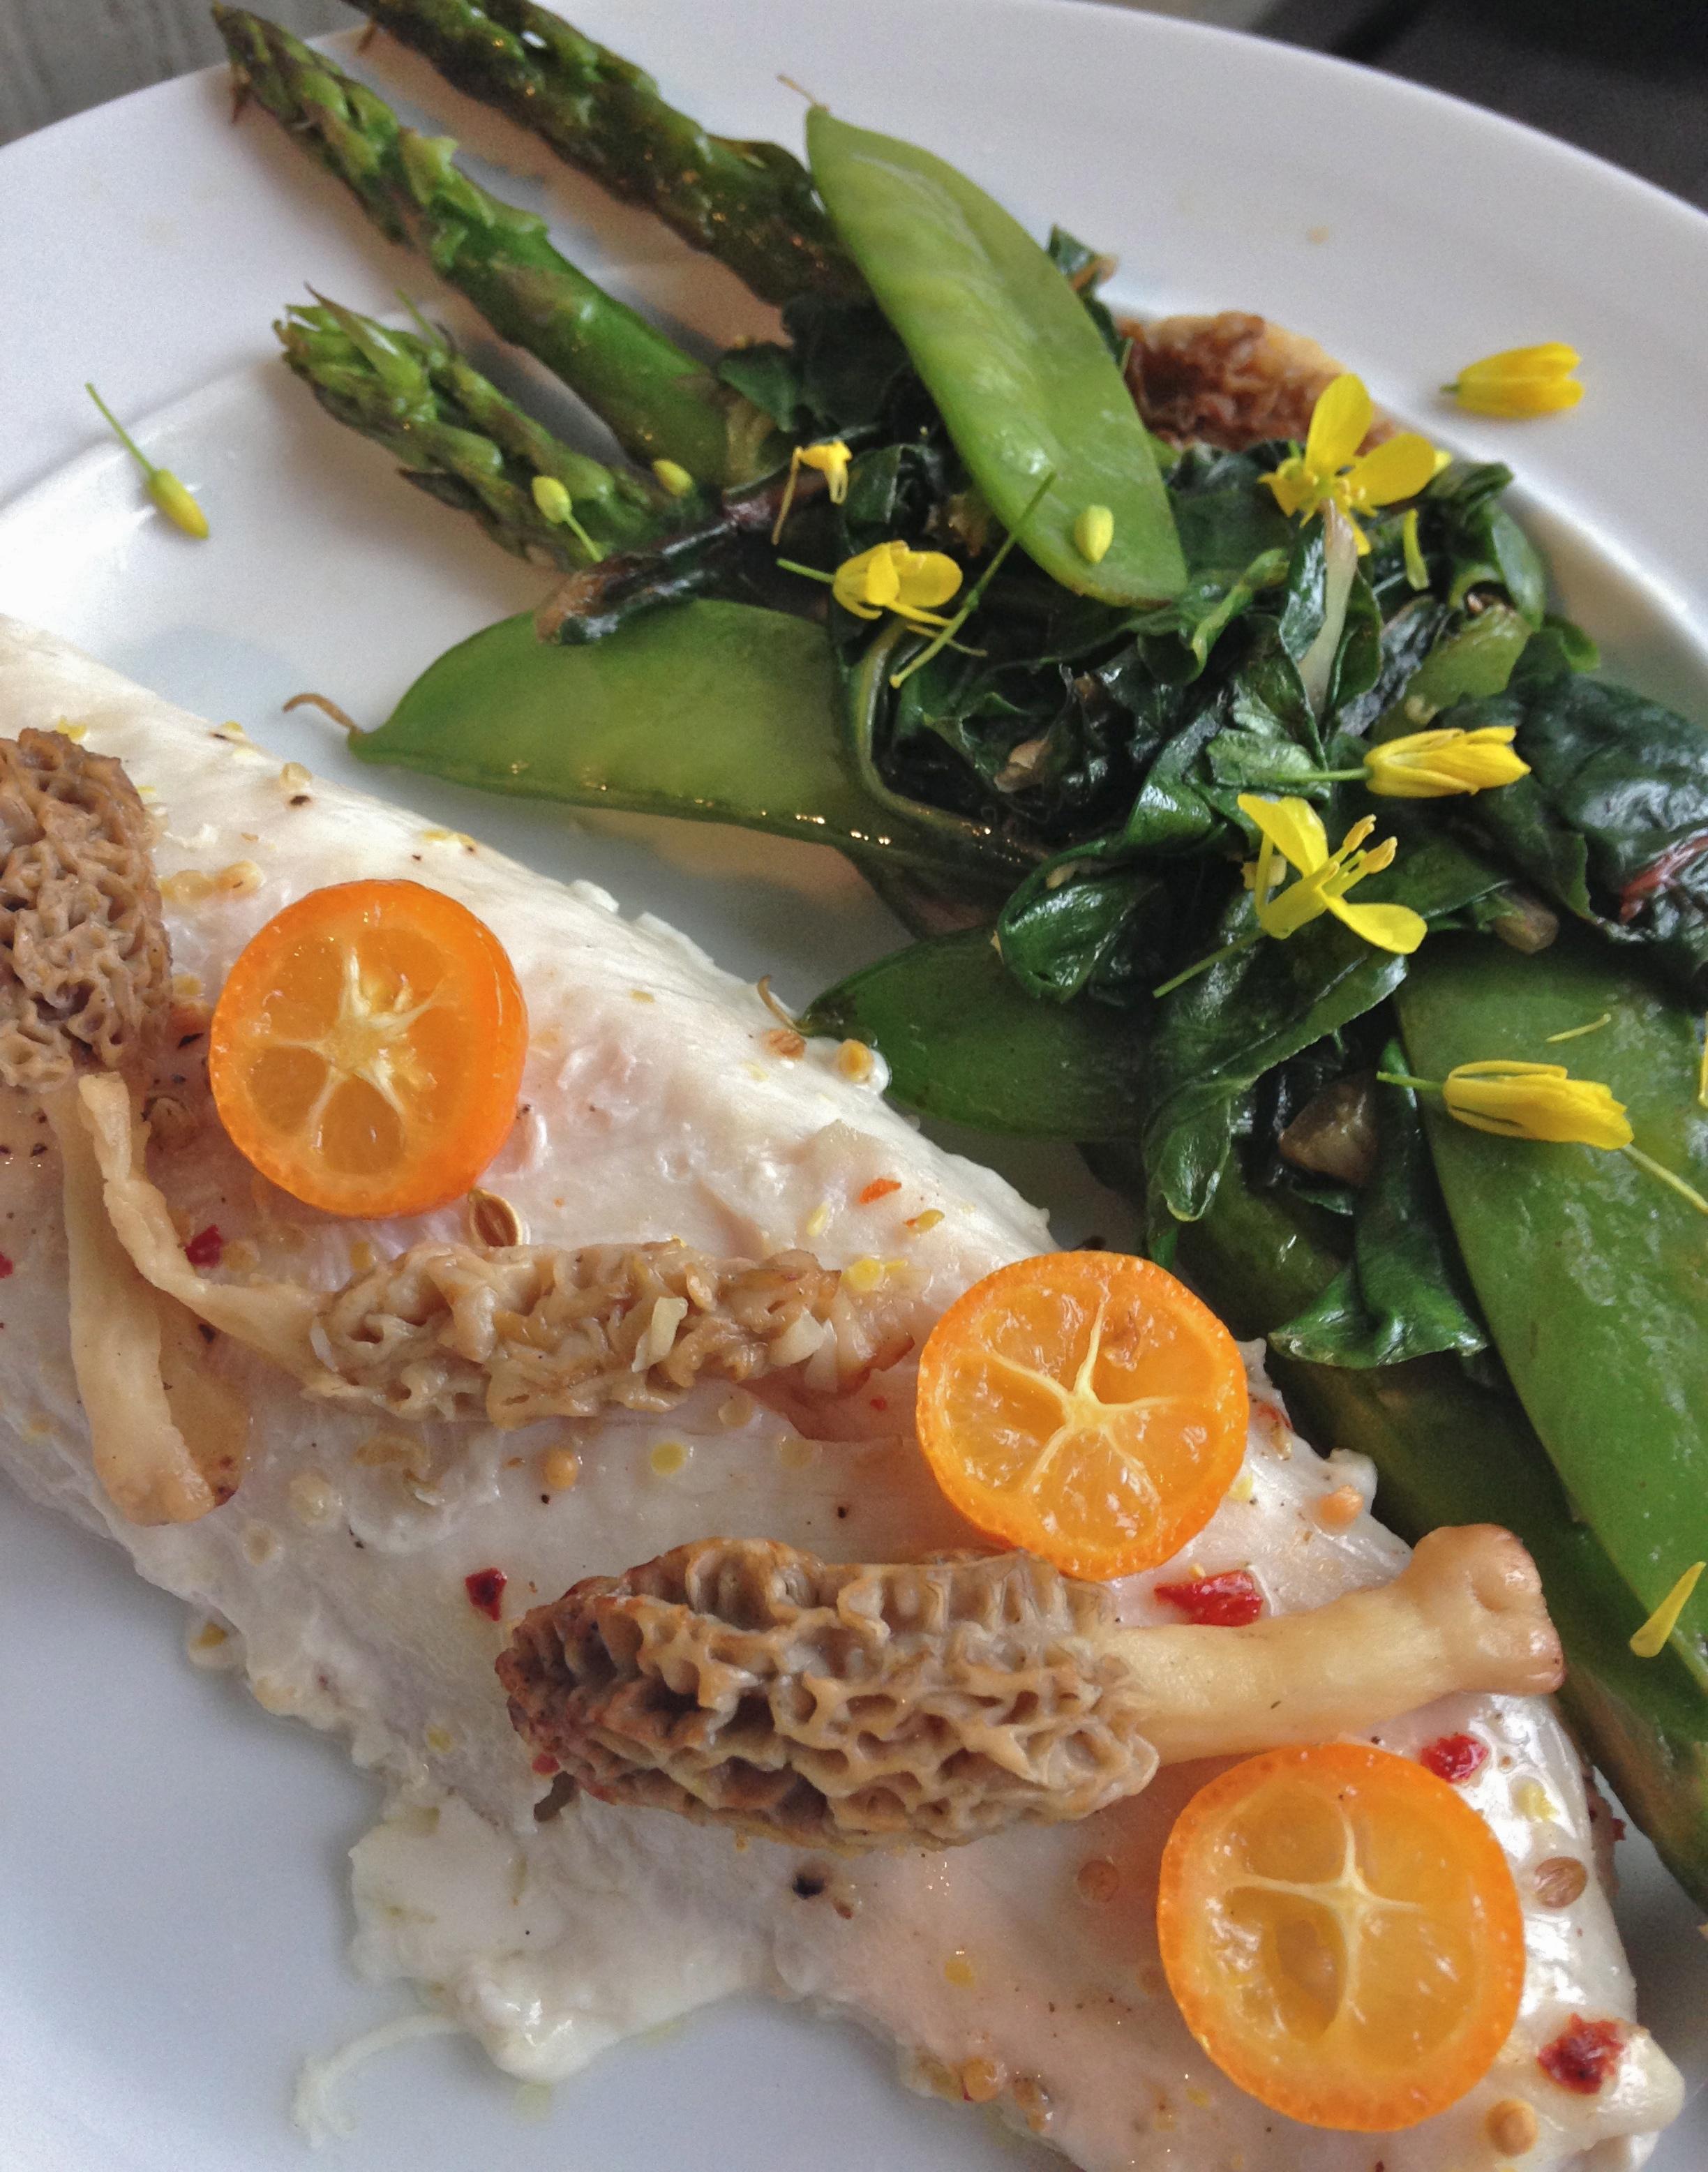 Broiled mahi mahi with morels, asparagus, peas, chard, and edible wild mustard flowers.